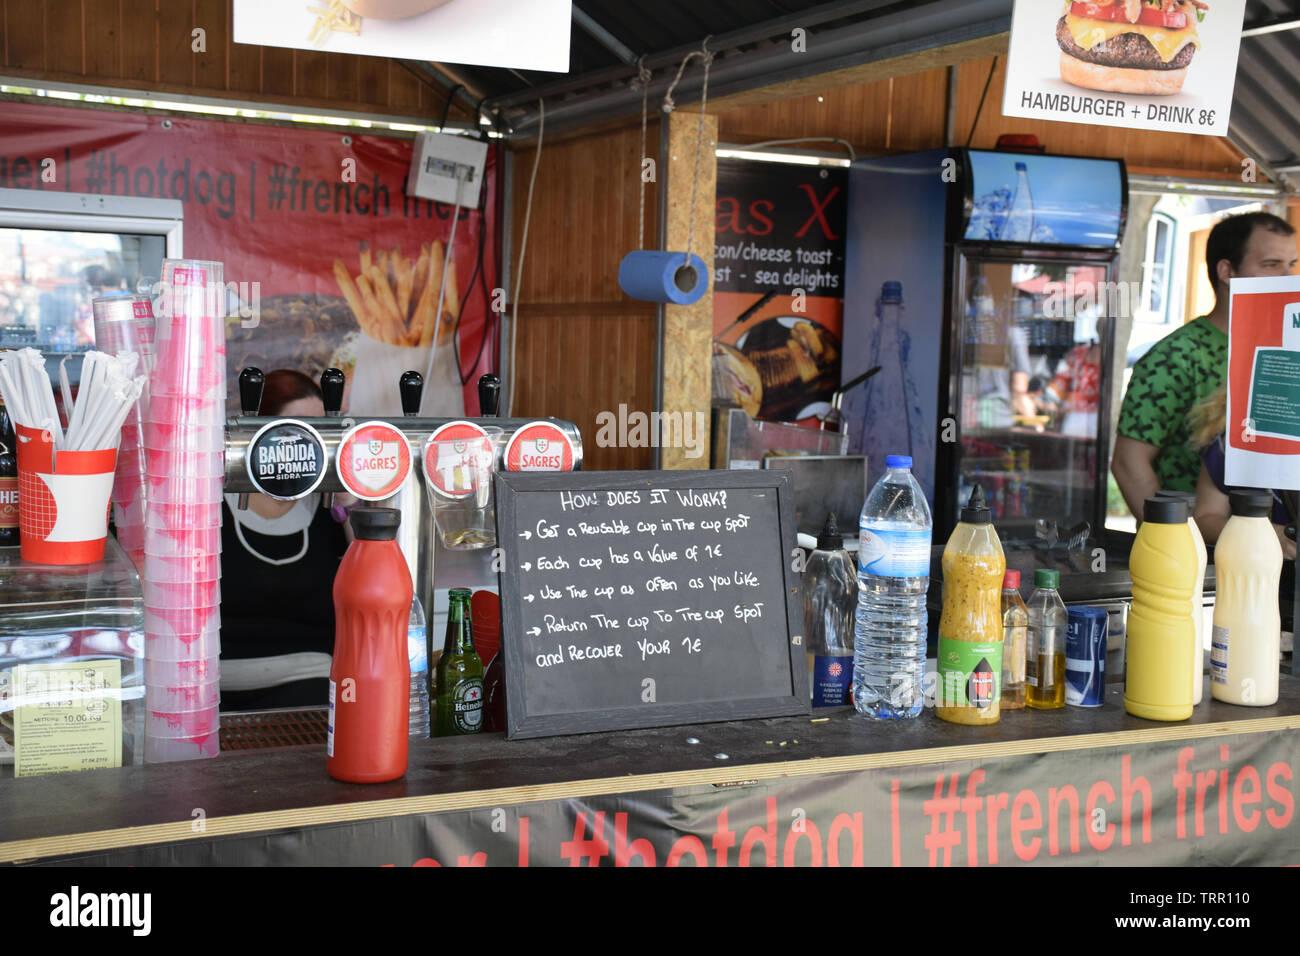 No single use plastic in this street cafe, Bairro Alto, Lisbon, Portugal, June 2019 - Stock Image